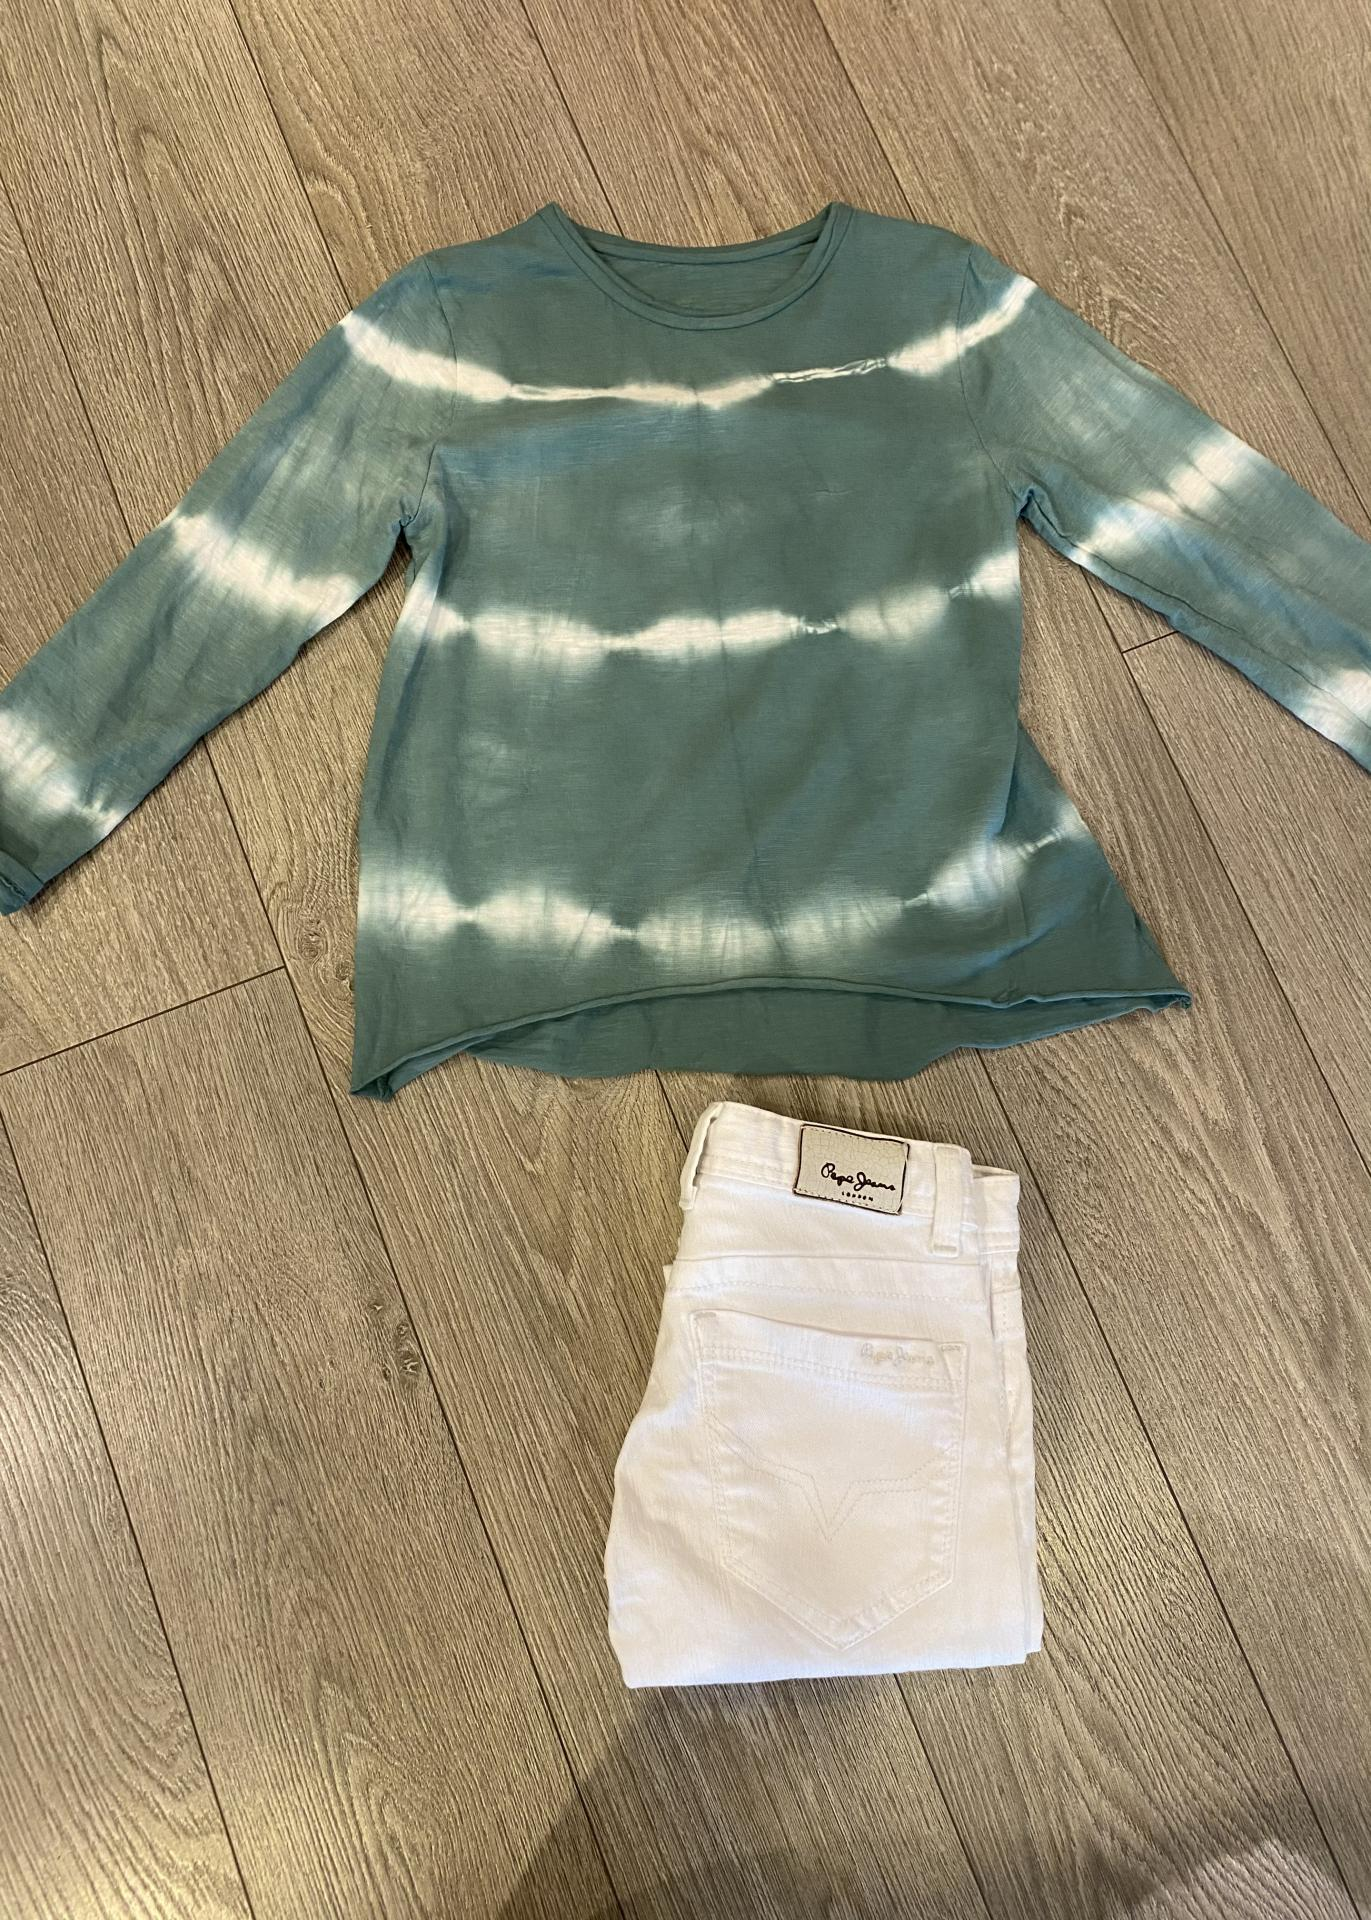 Camiseta verde mint